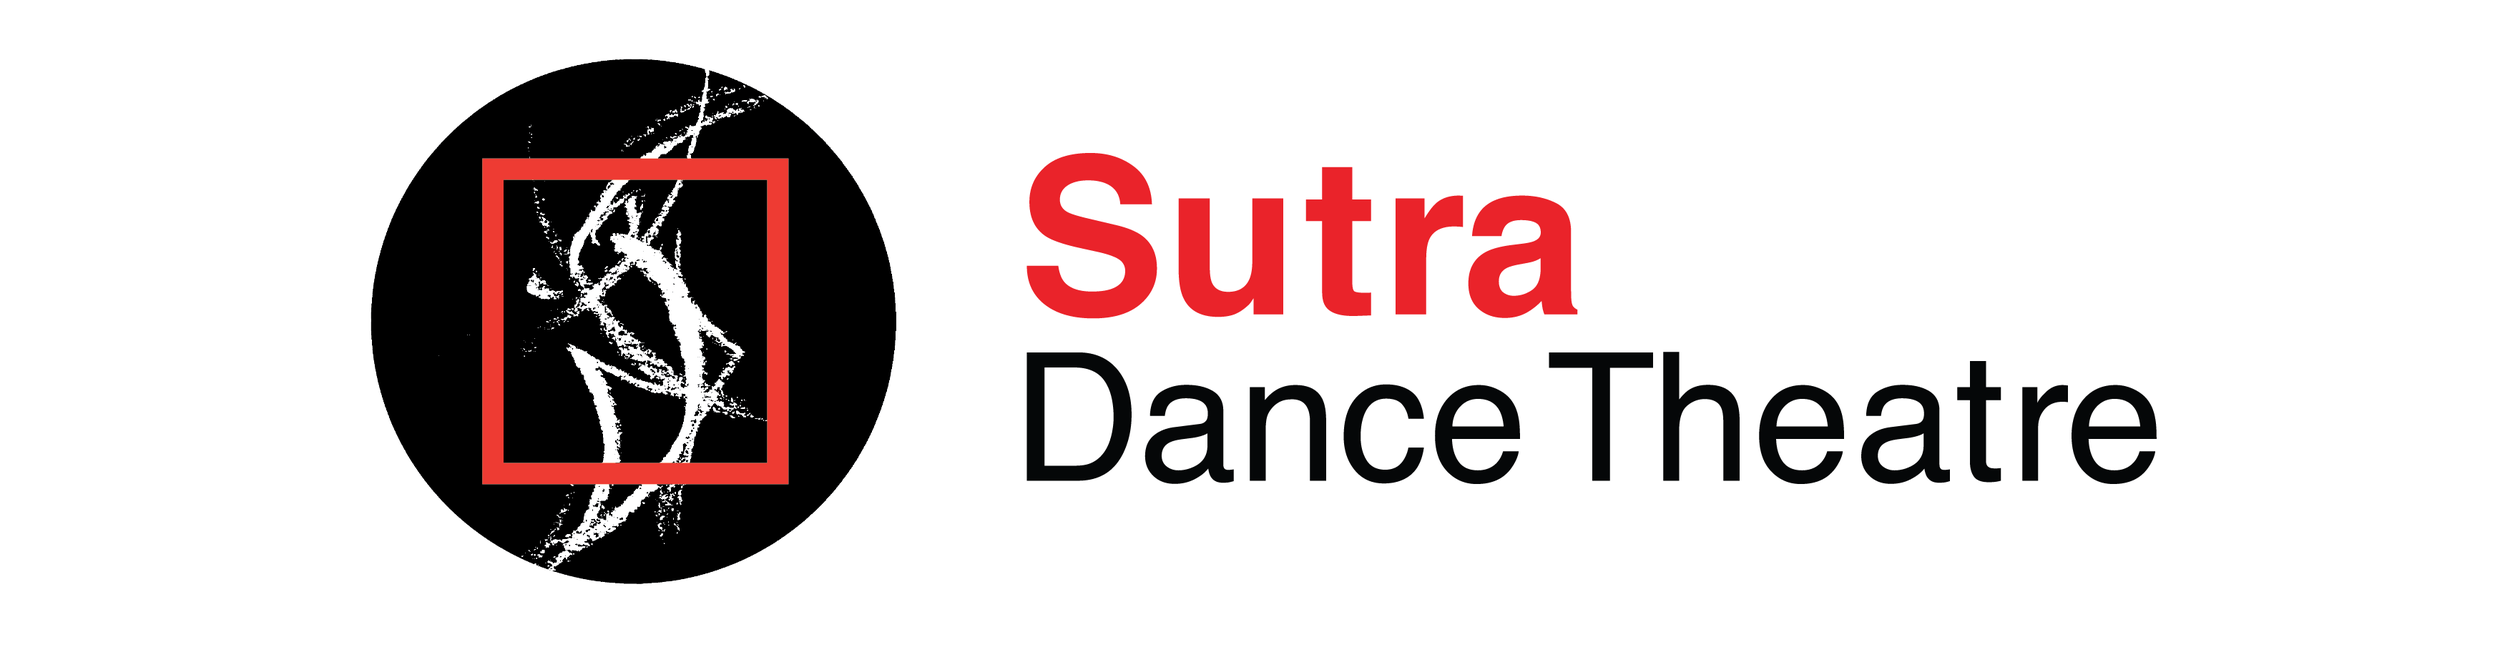 LO4c_Sutra Dance Theatre_hori_2004.png